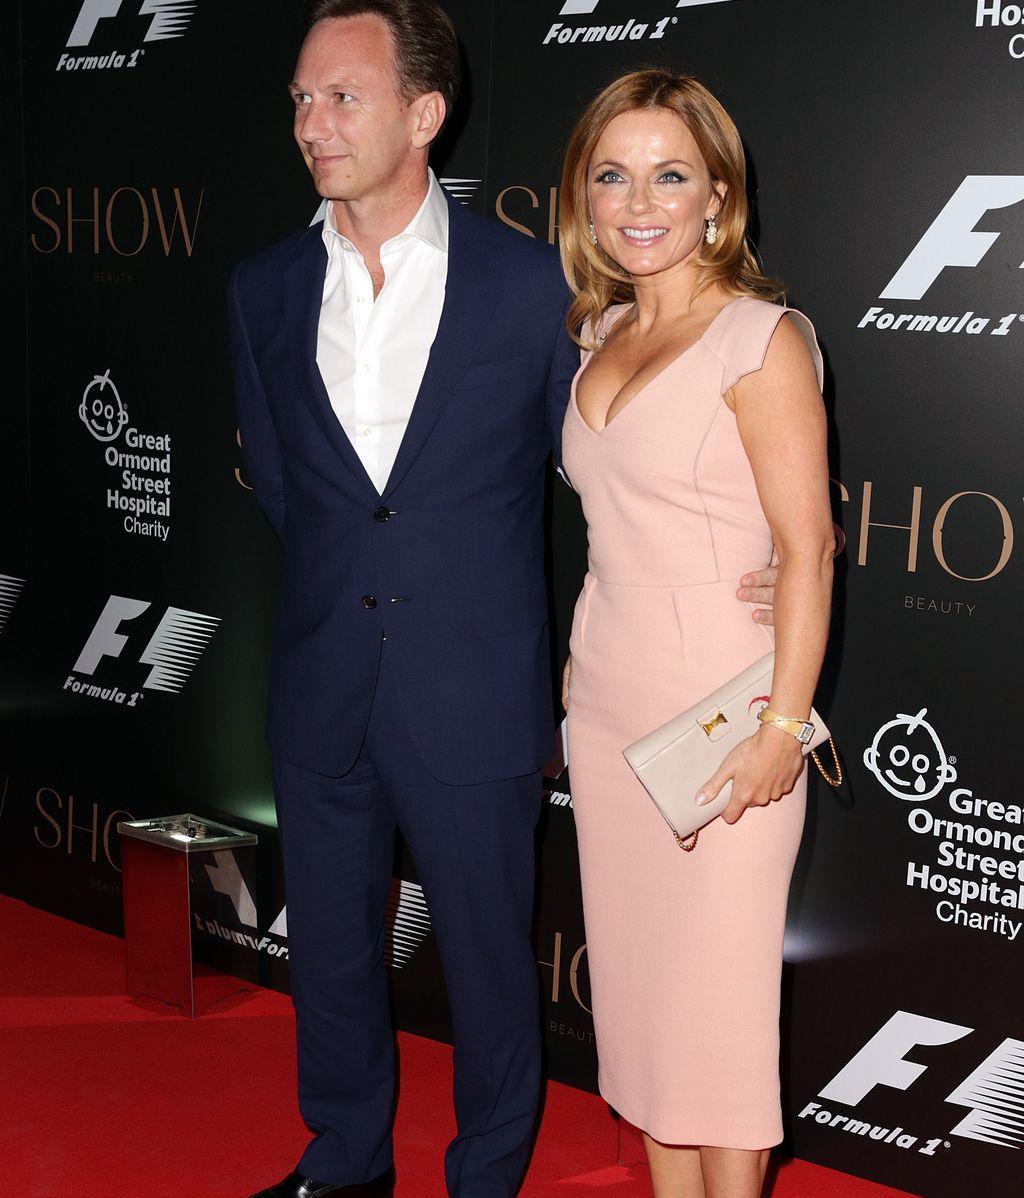 Geri Halliwell y Christian Horner el director del equipo de F1 Red Bull se casan